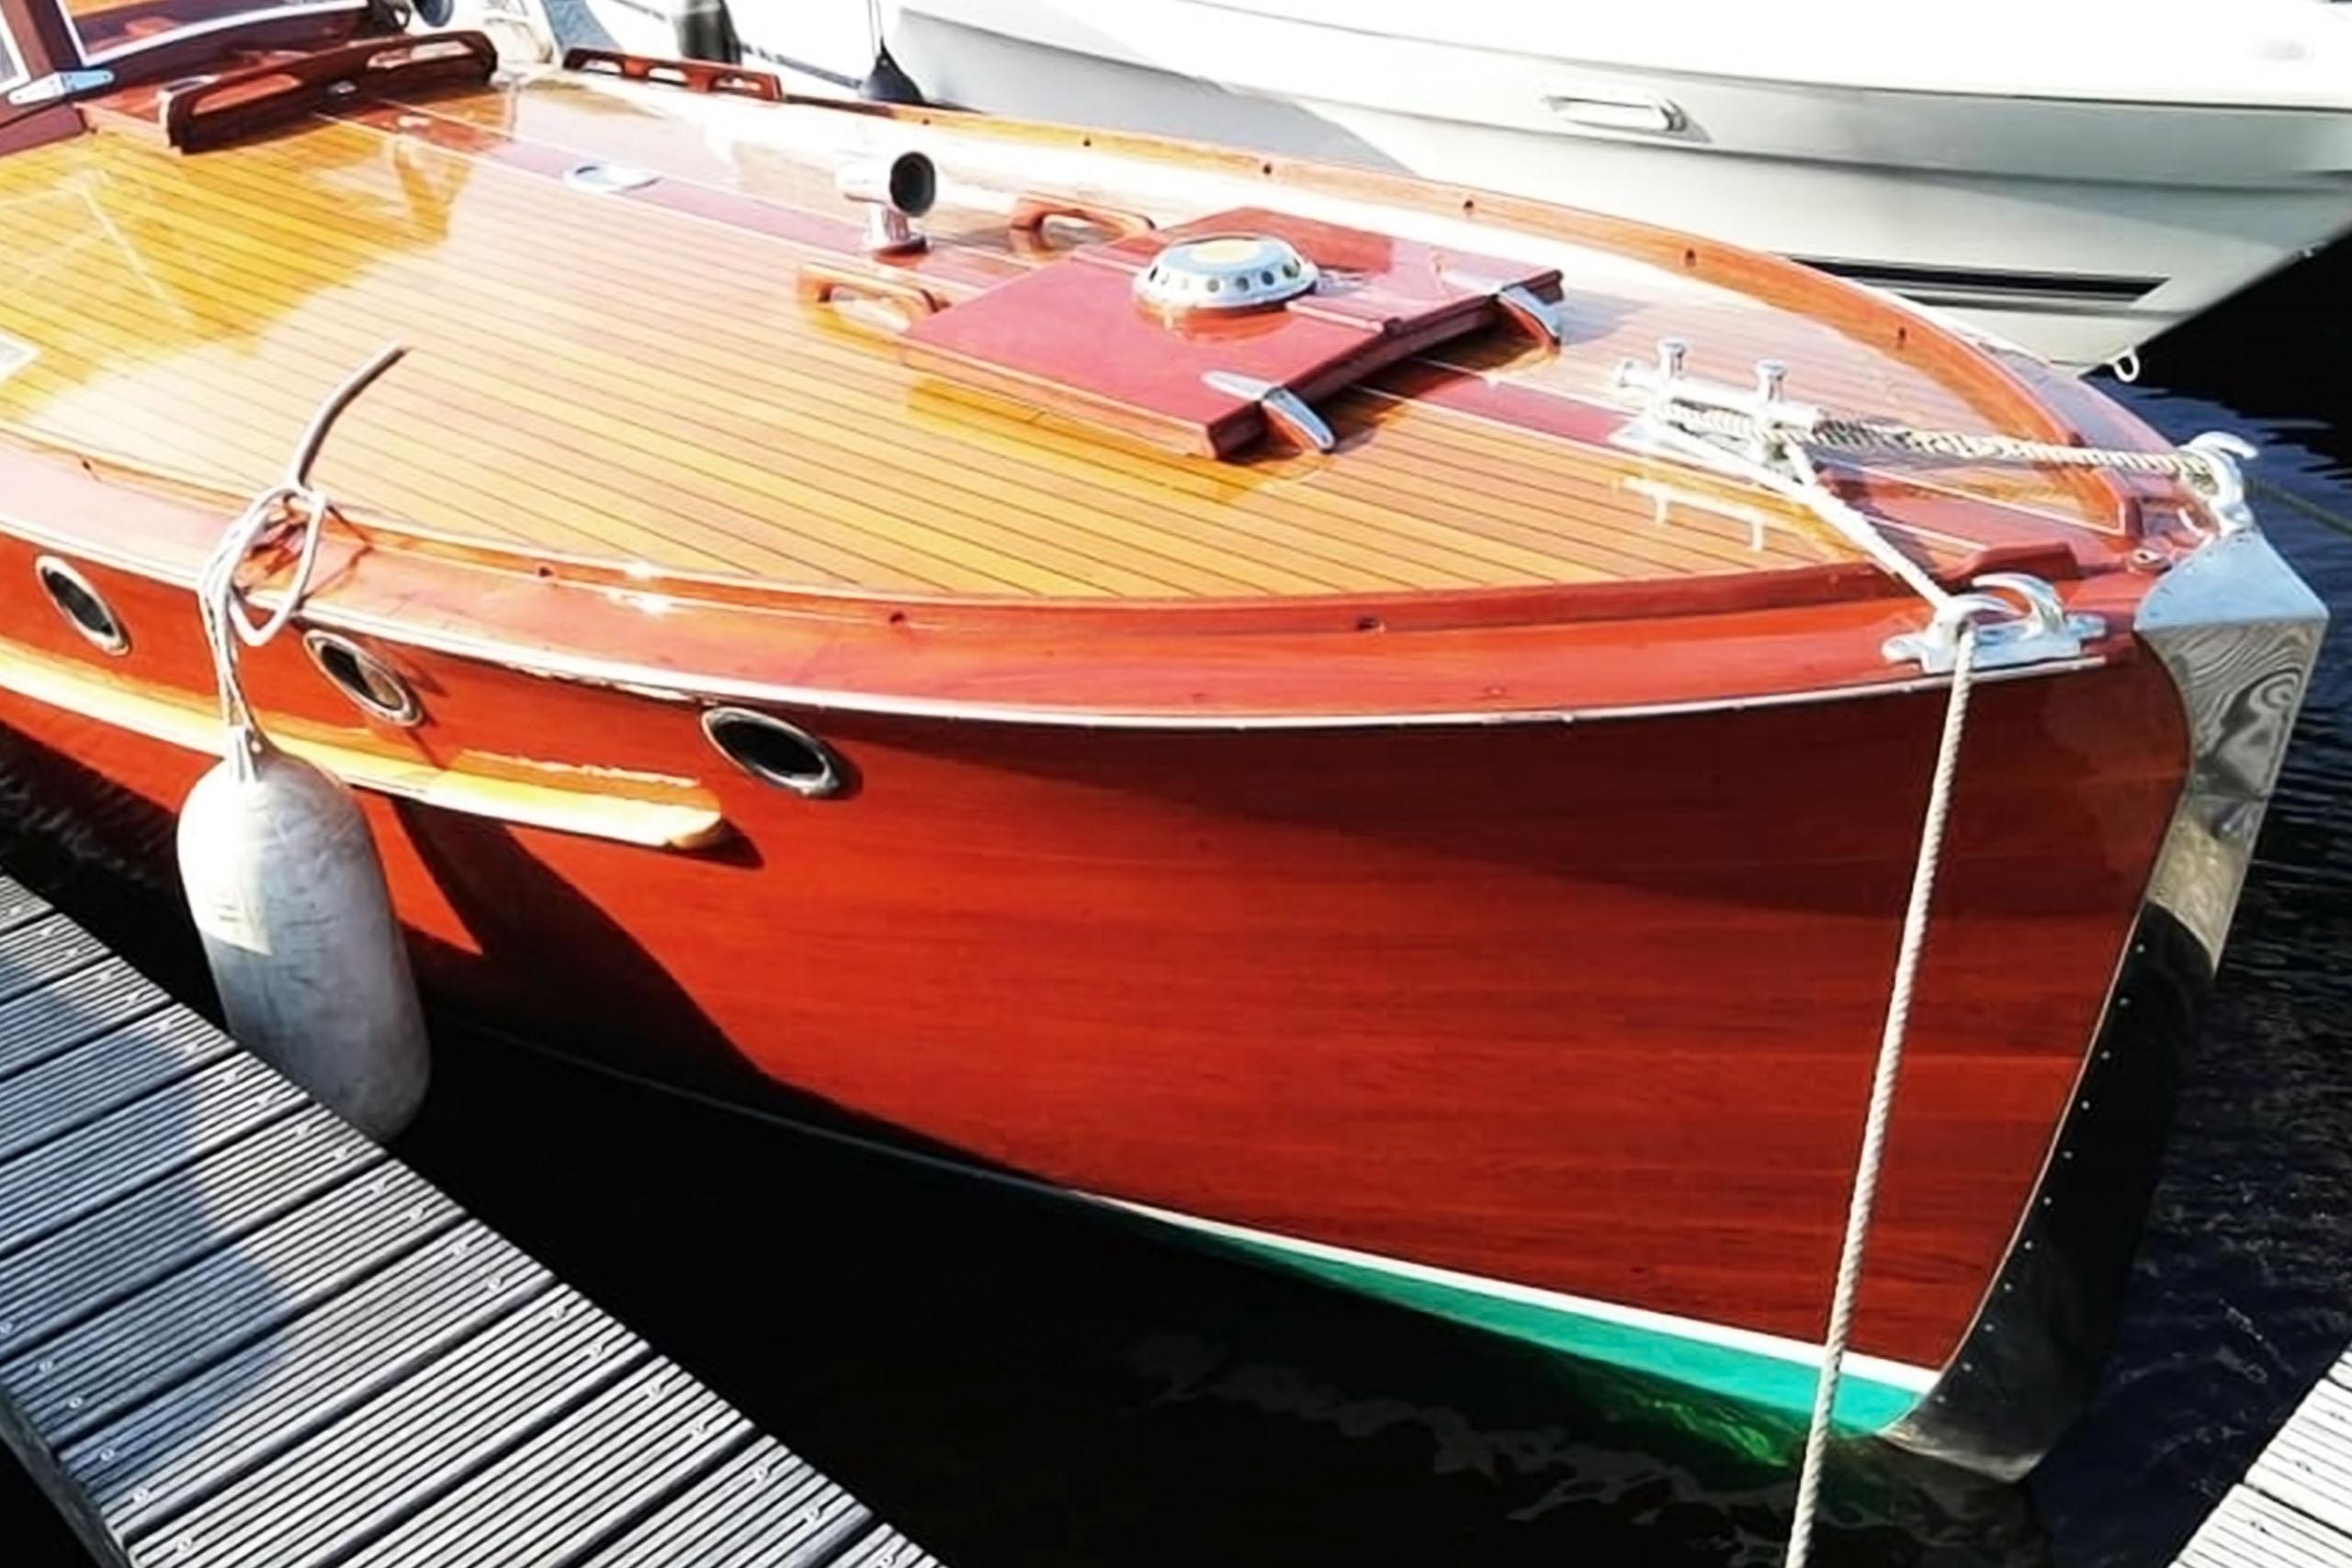 Jachtschilder Friesland-jacht-houten-boot-sloep-bootlak-Coelan-bootcoating-classic-design-yacht-painter- Hendrik Veltman